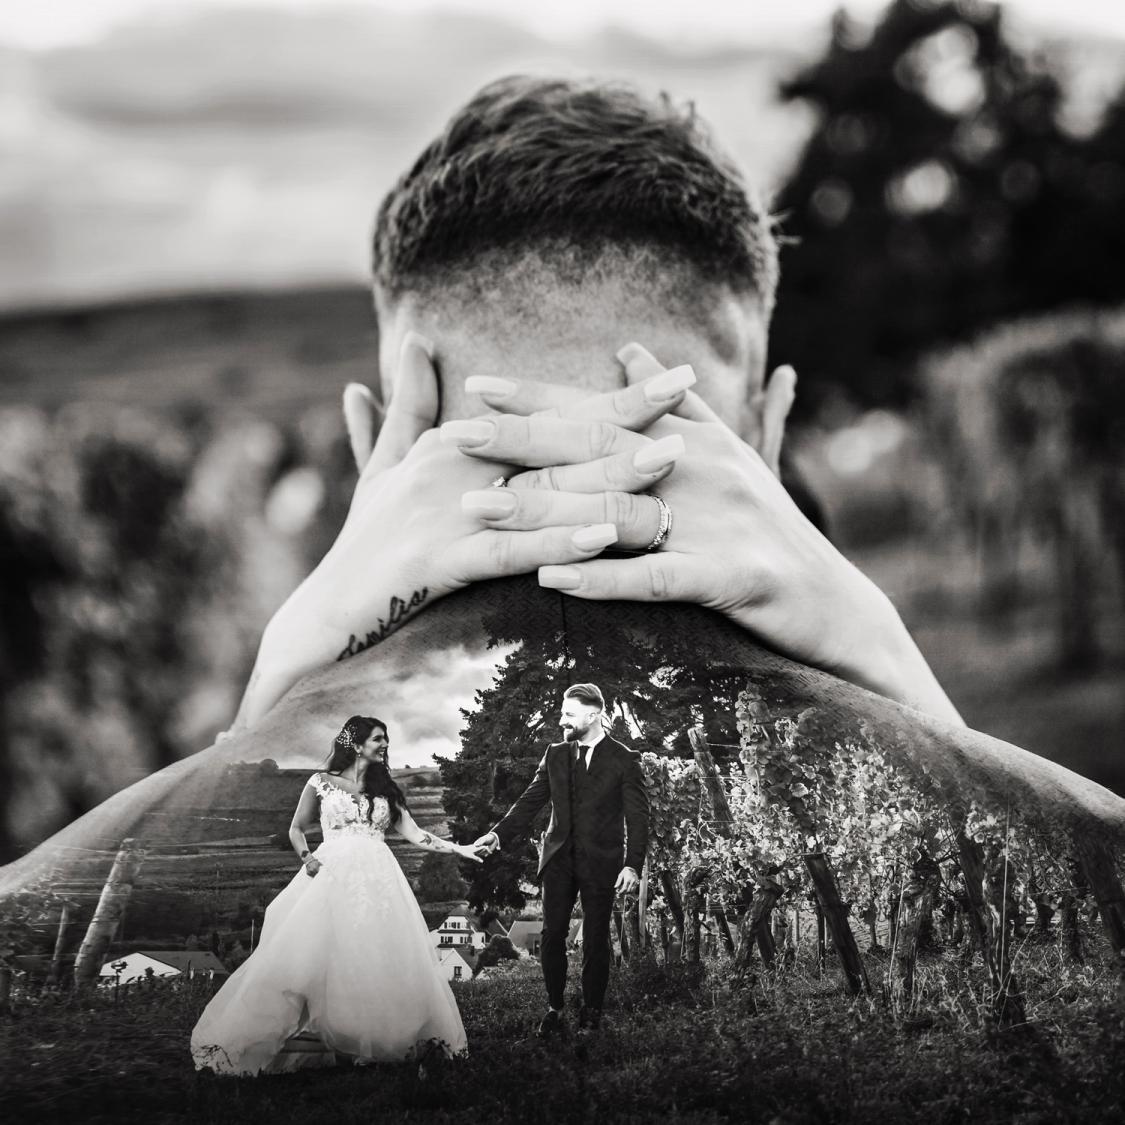 Photographe Mariage Alsace - Photographe Mariage Haut-Rhin – Photographe Mariage Mulhouse – Photographe Mariage 68 – Photographe Mariage Colmar – Photographe Mariage Belfort - Photographe Mariage Alternatif Alsace - Photographe Mariage Alternatif Mulhouse - Photographe Mariage Alternatif Haut-Rhin - Wedding Photographer - Bertrand DISDIER Photographe